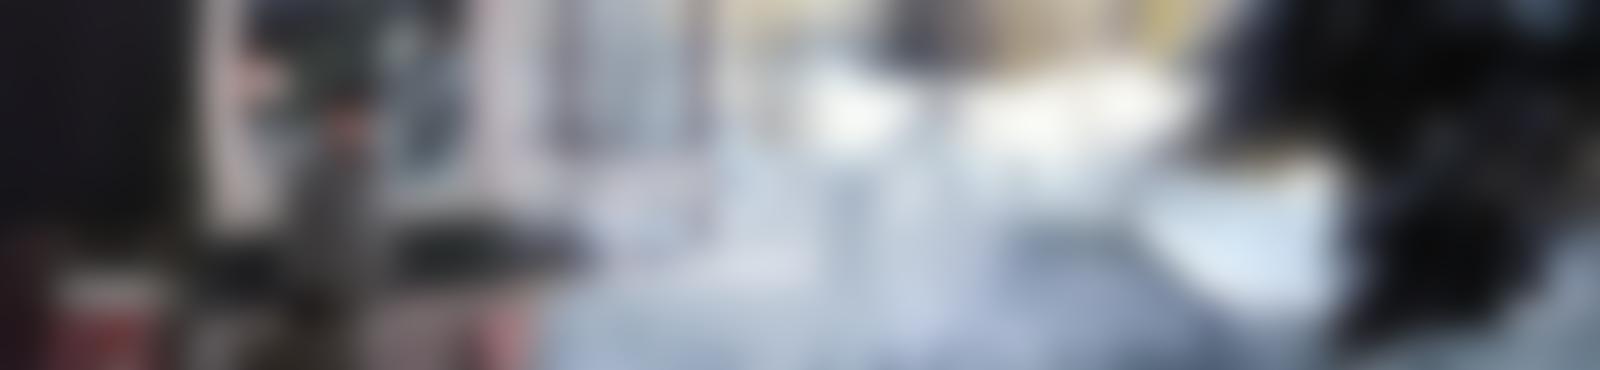 Blurred 17b08d2a 7dfa 424c a436 fc10b4c623df